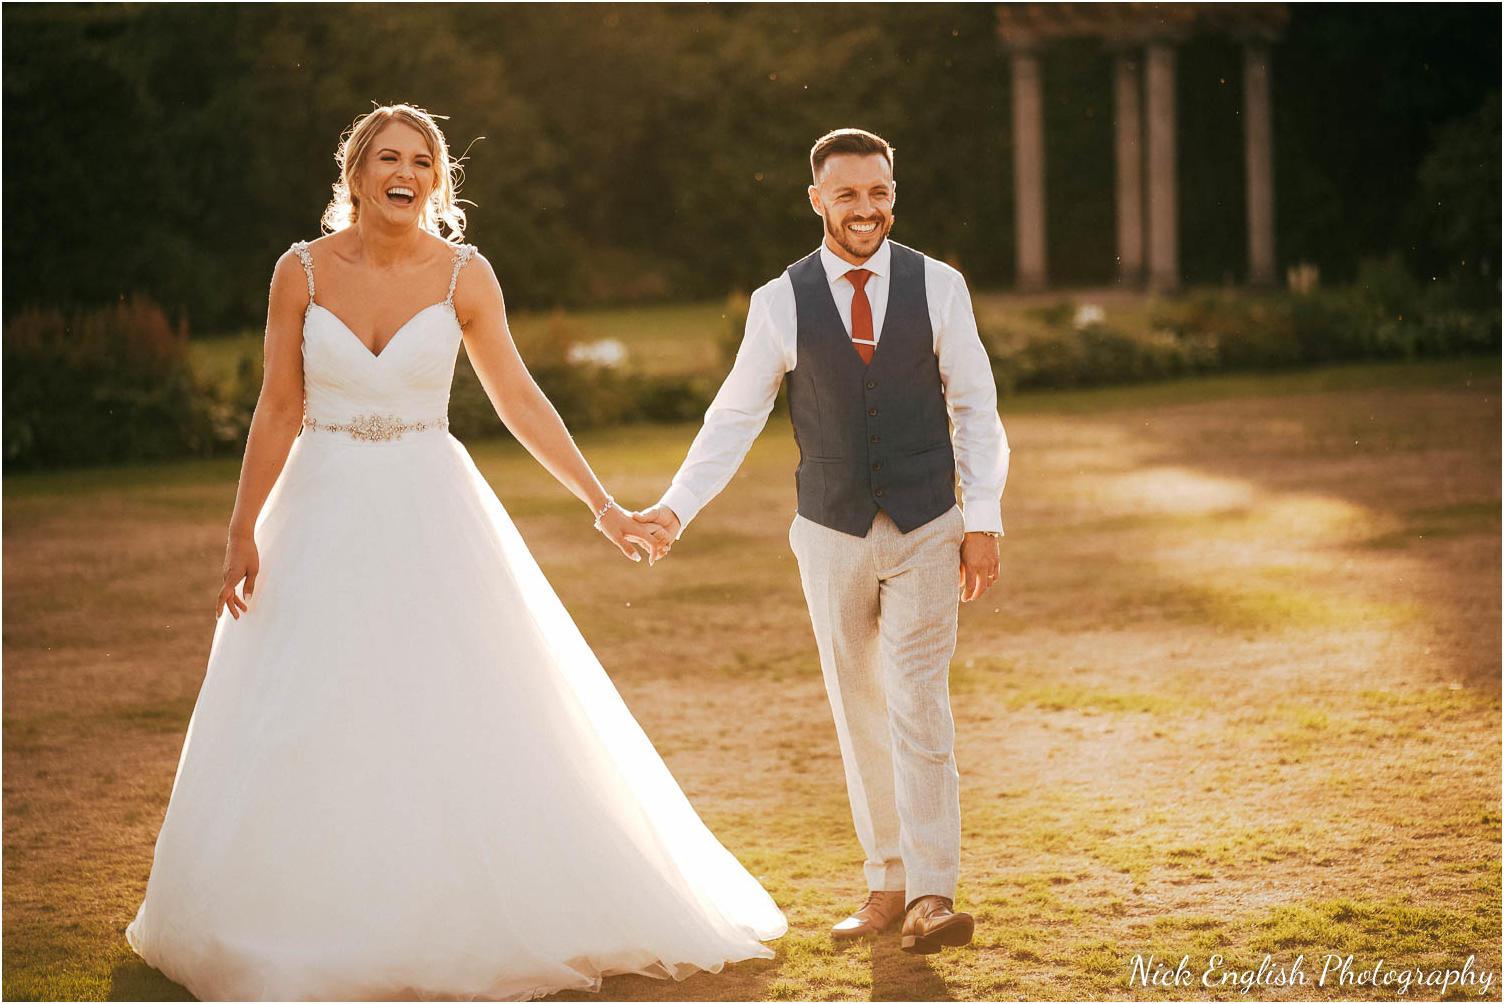 Eaves_Hall_Outdoor_Wedding-155.jpg